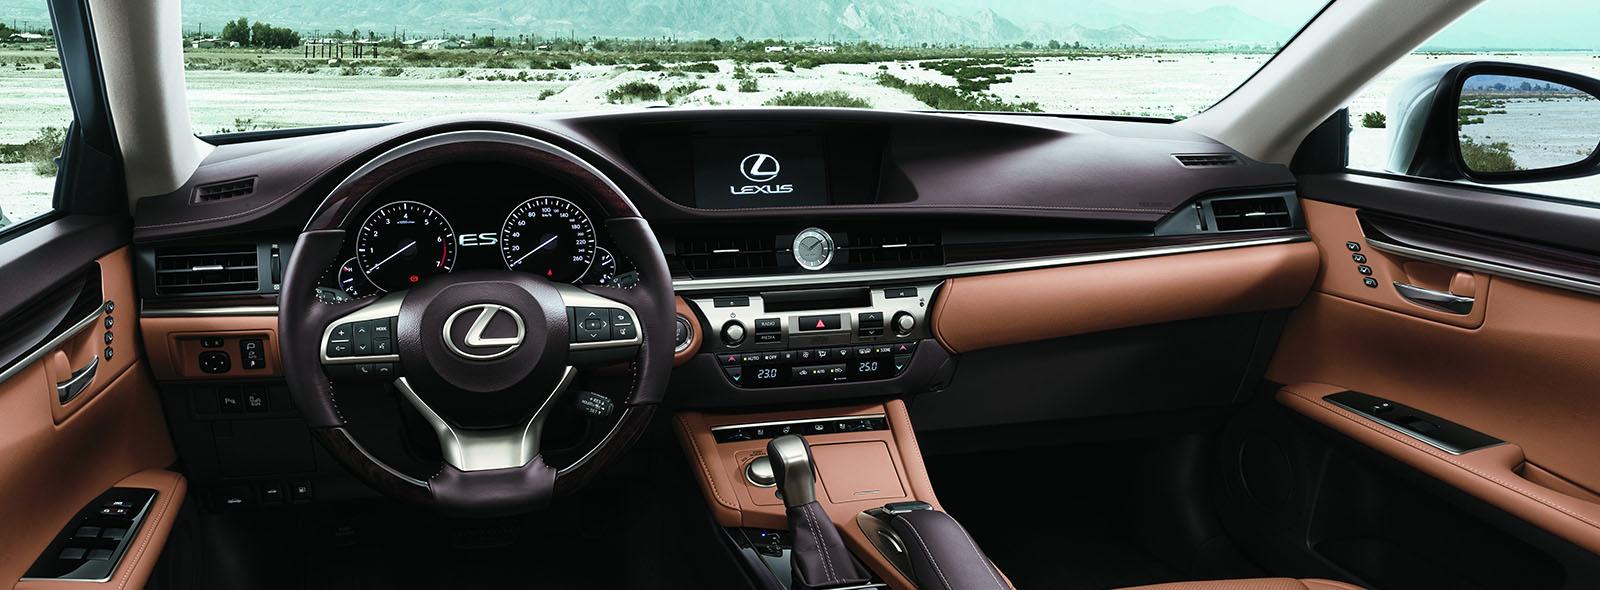 Внутренний вид Lexus ES 250